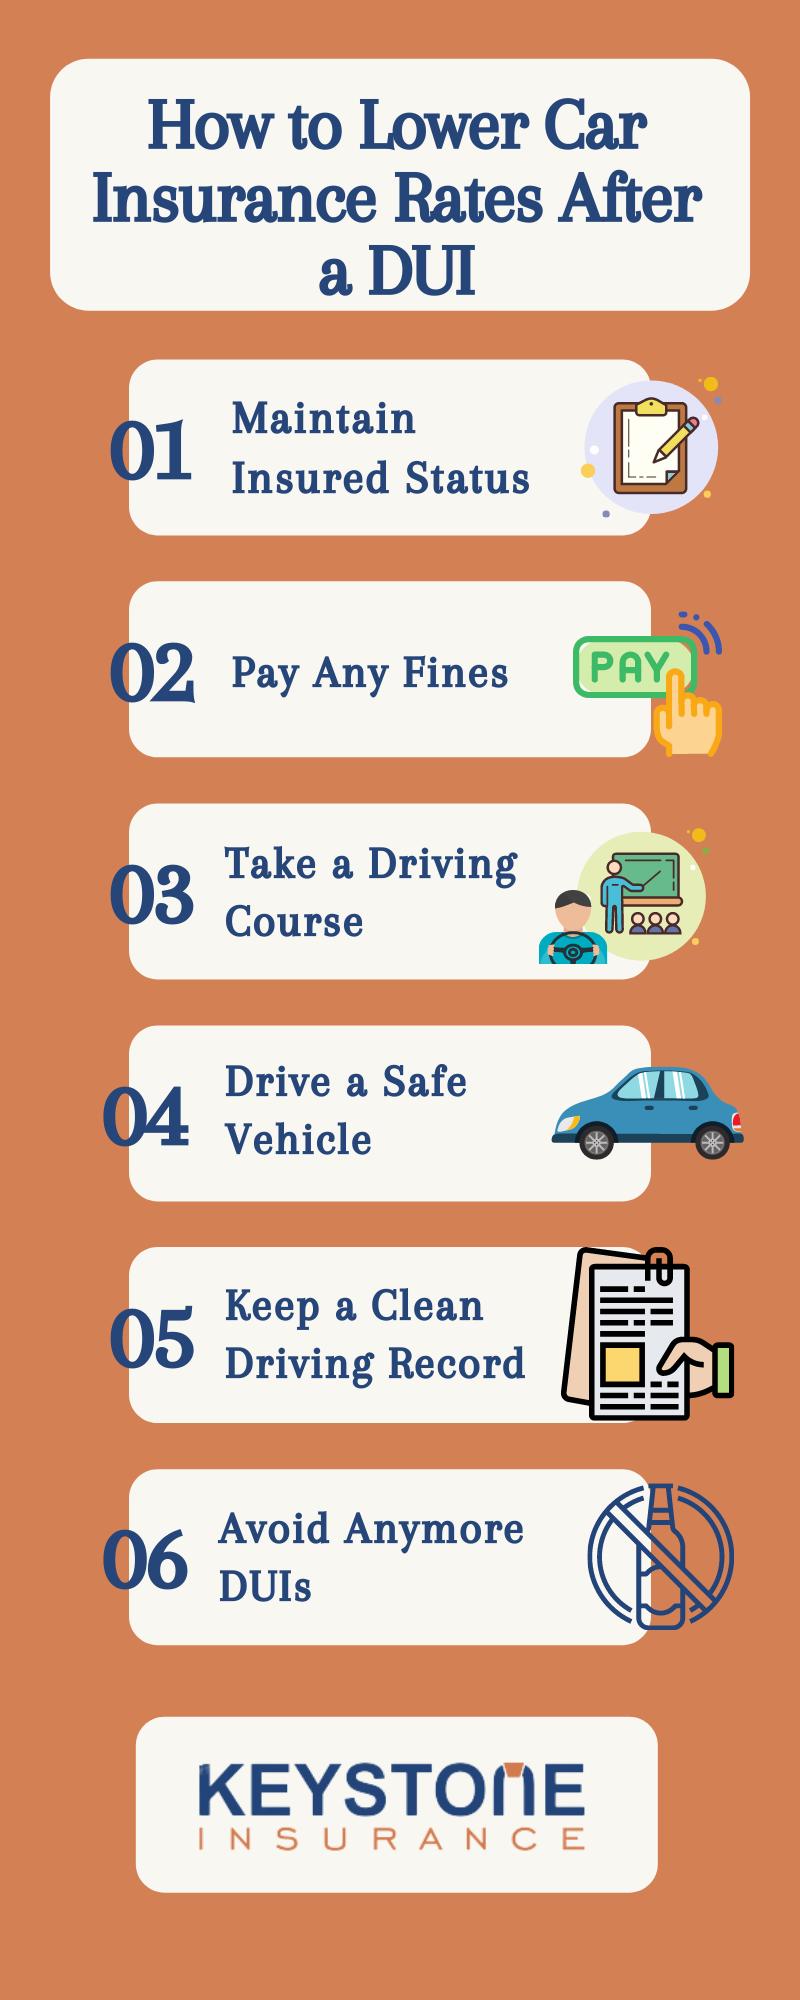 How to lower car insurance DUI Keystone